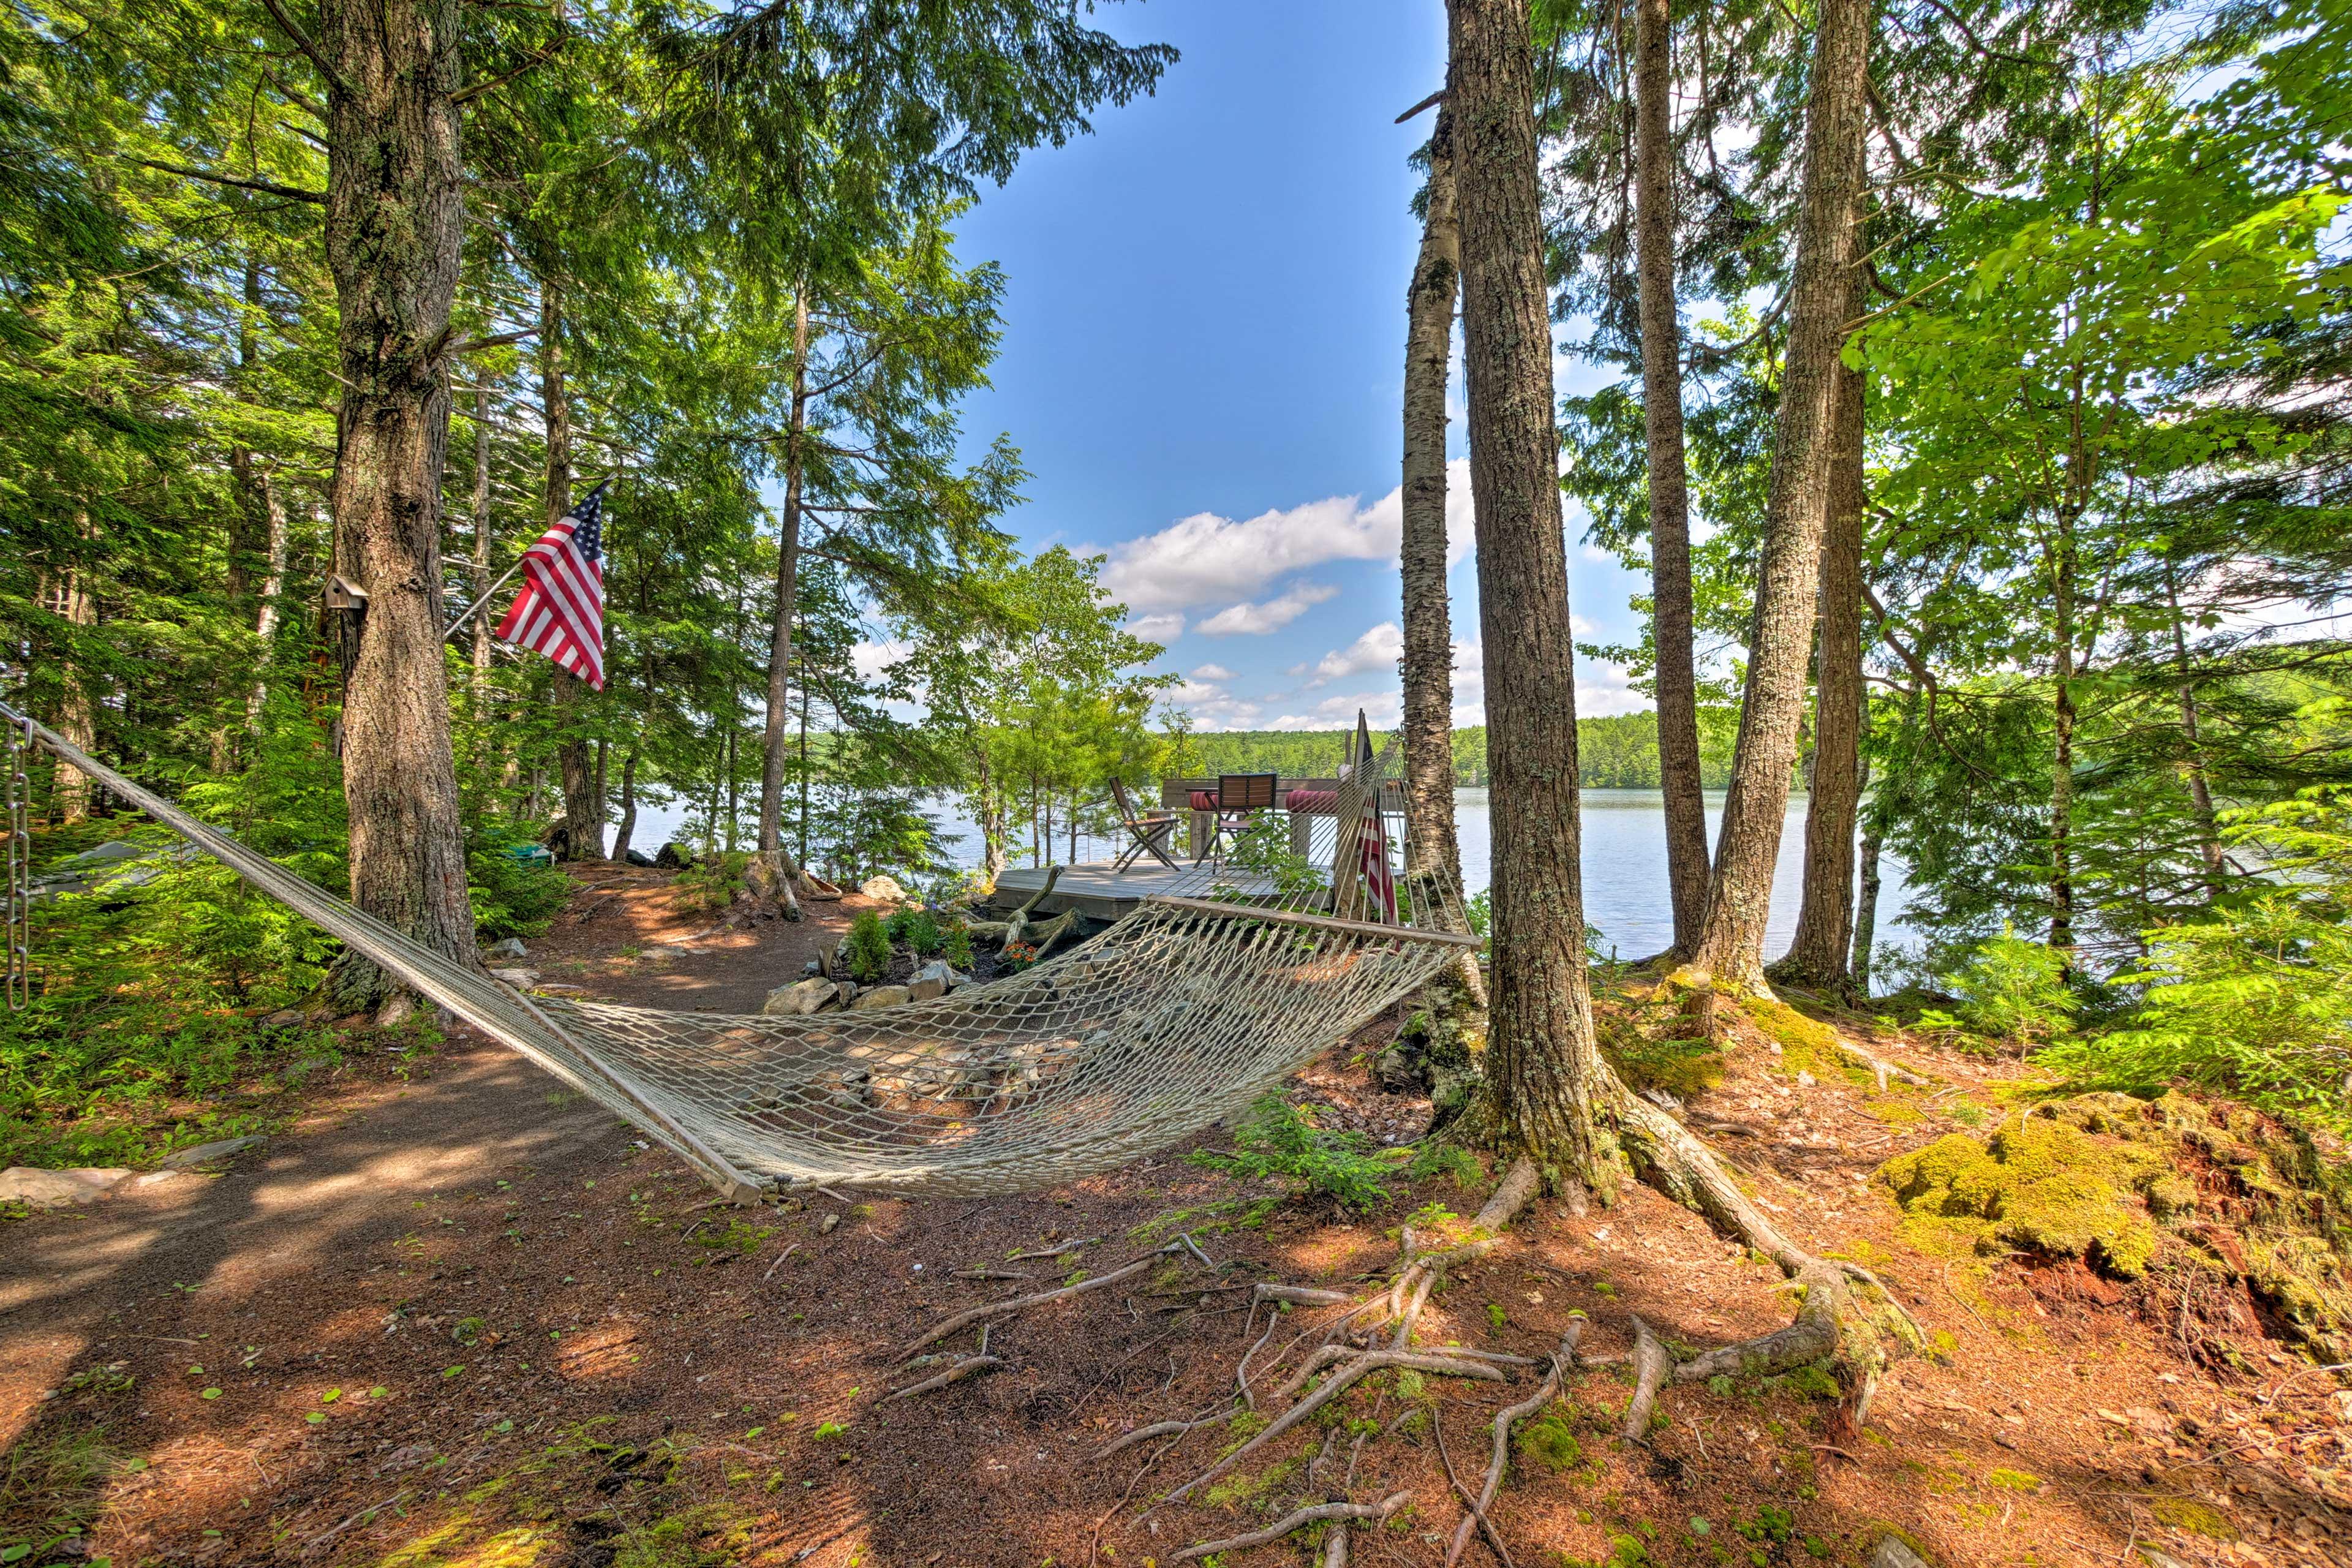 Enjoy lakeside leisure at this 2-bedroom, 1-bathroom Great Pond, Maine cottage!